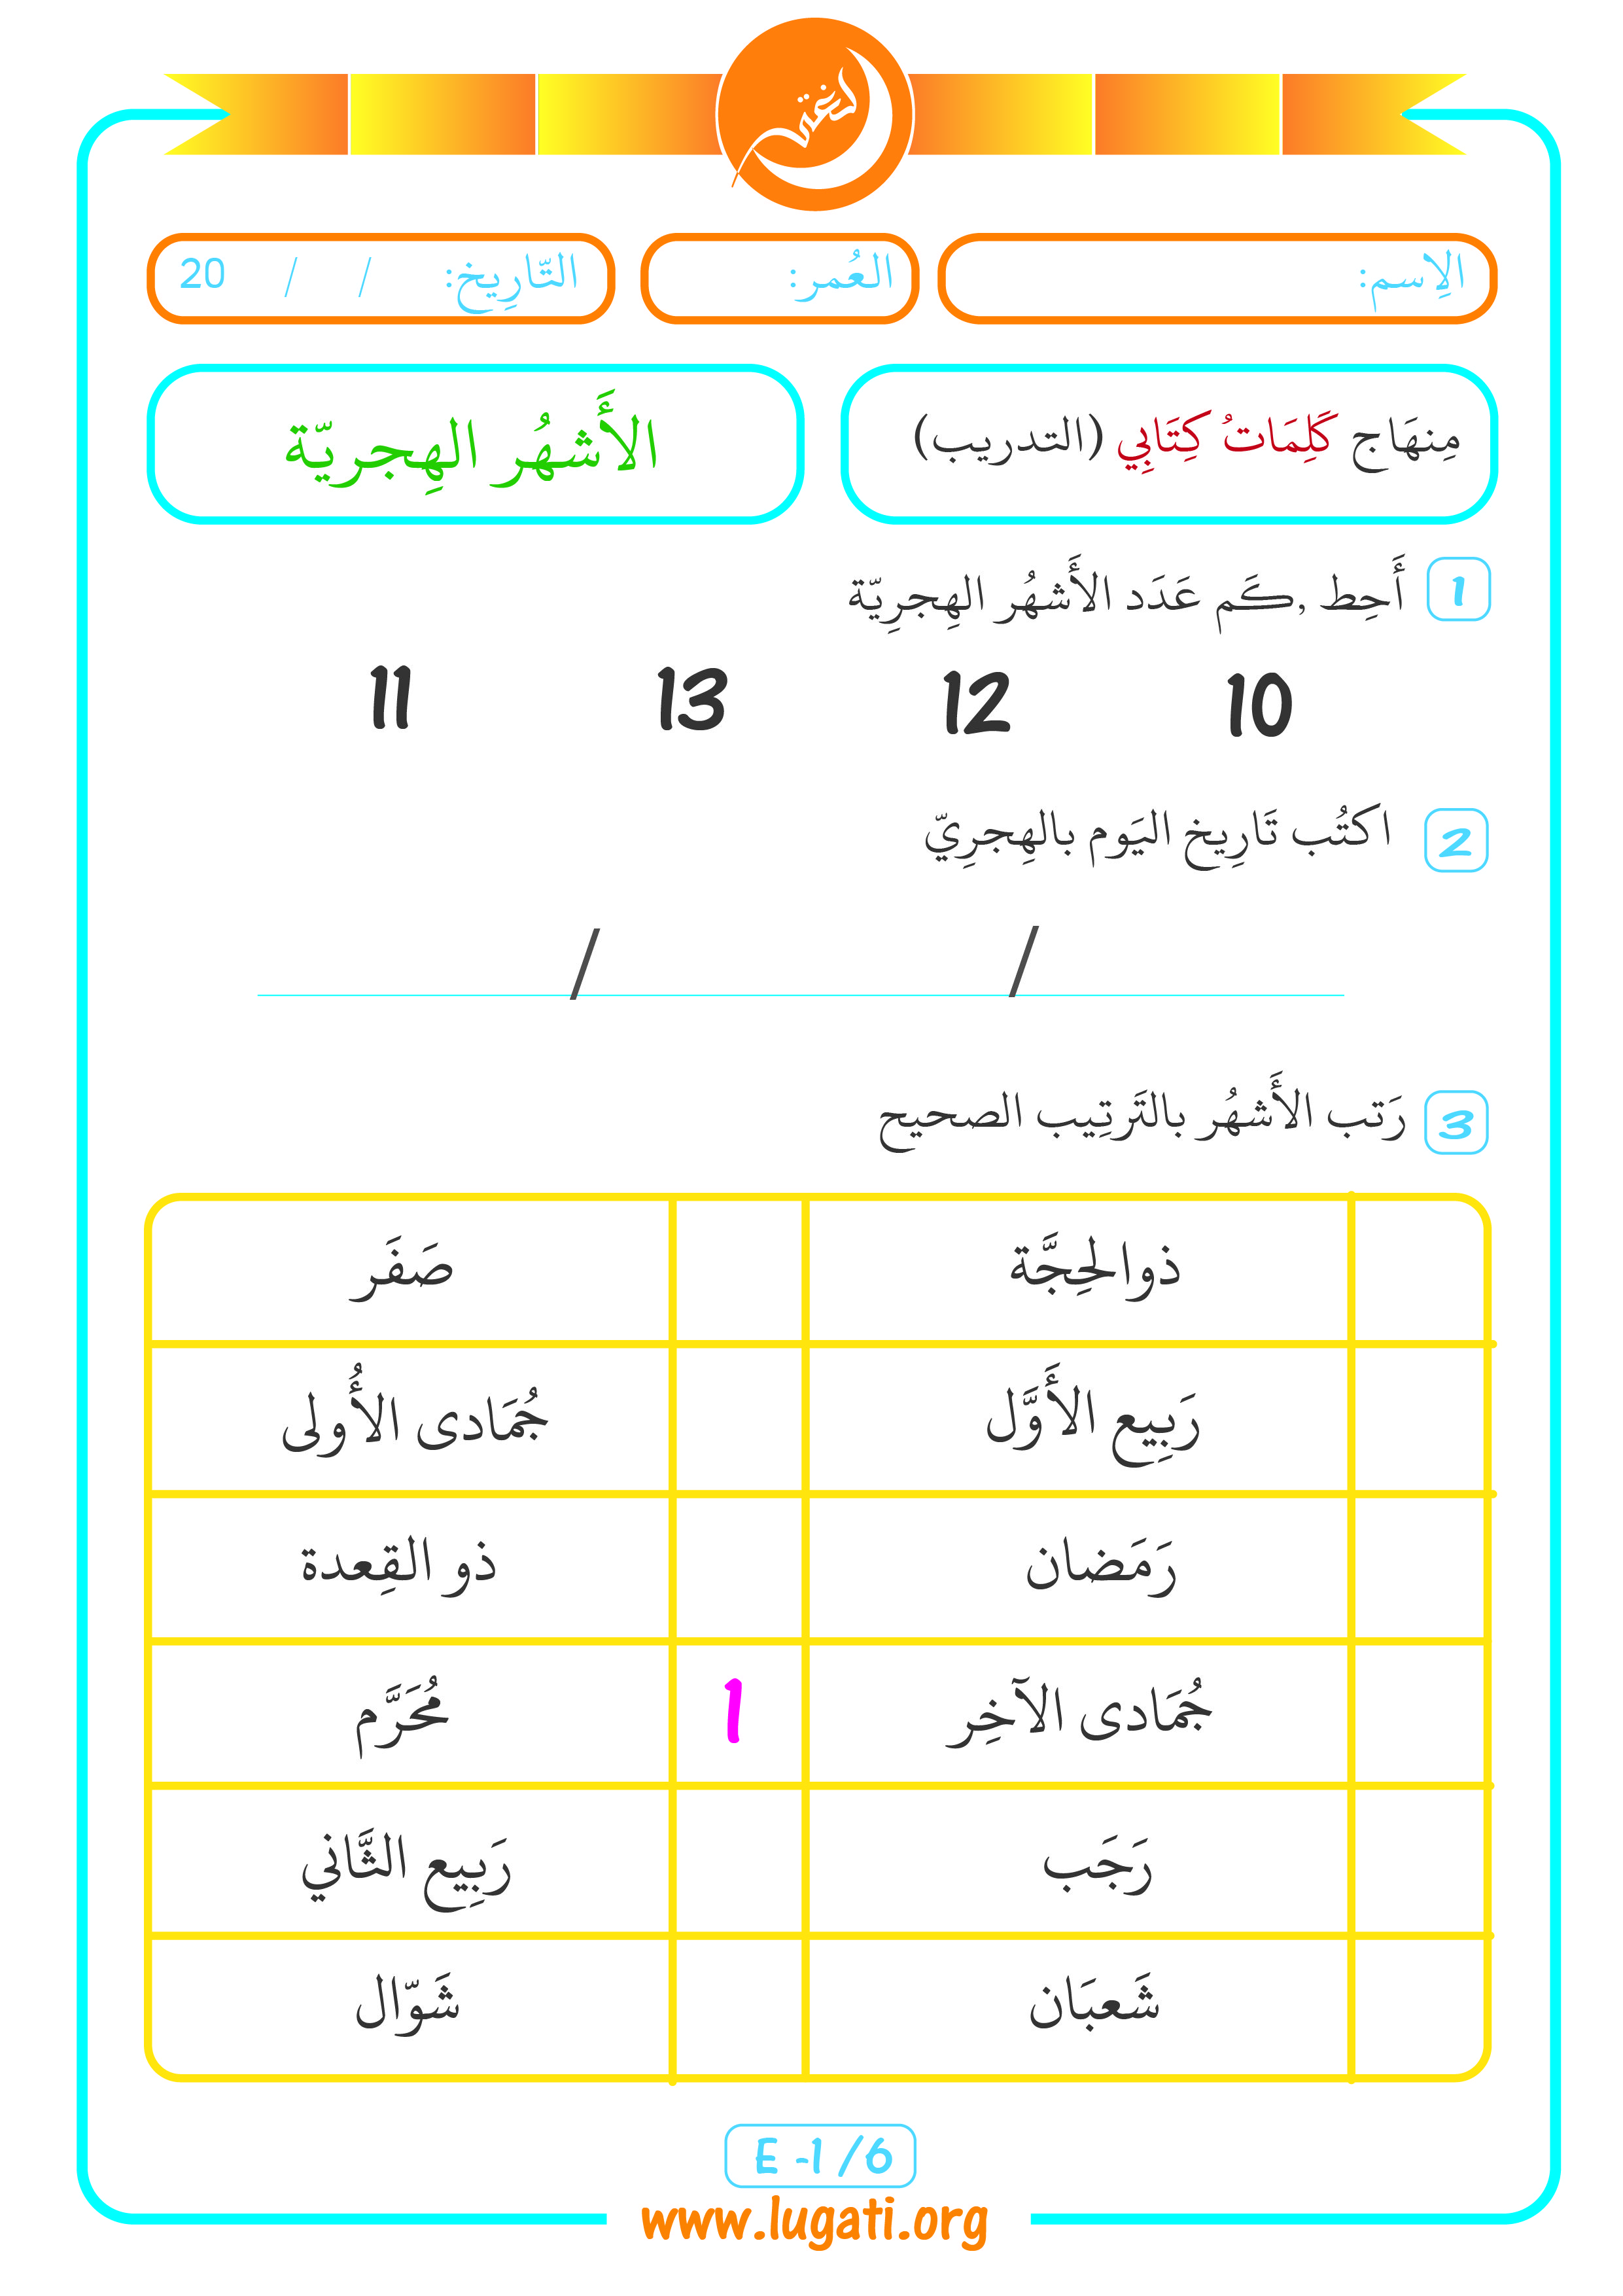 Hijri Months E1 Islam For Kids Arabic Alphabet For Kids Islamic Kids Activities